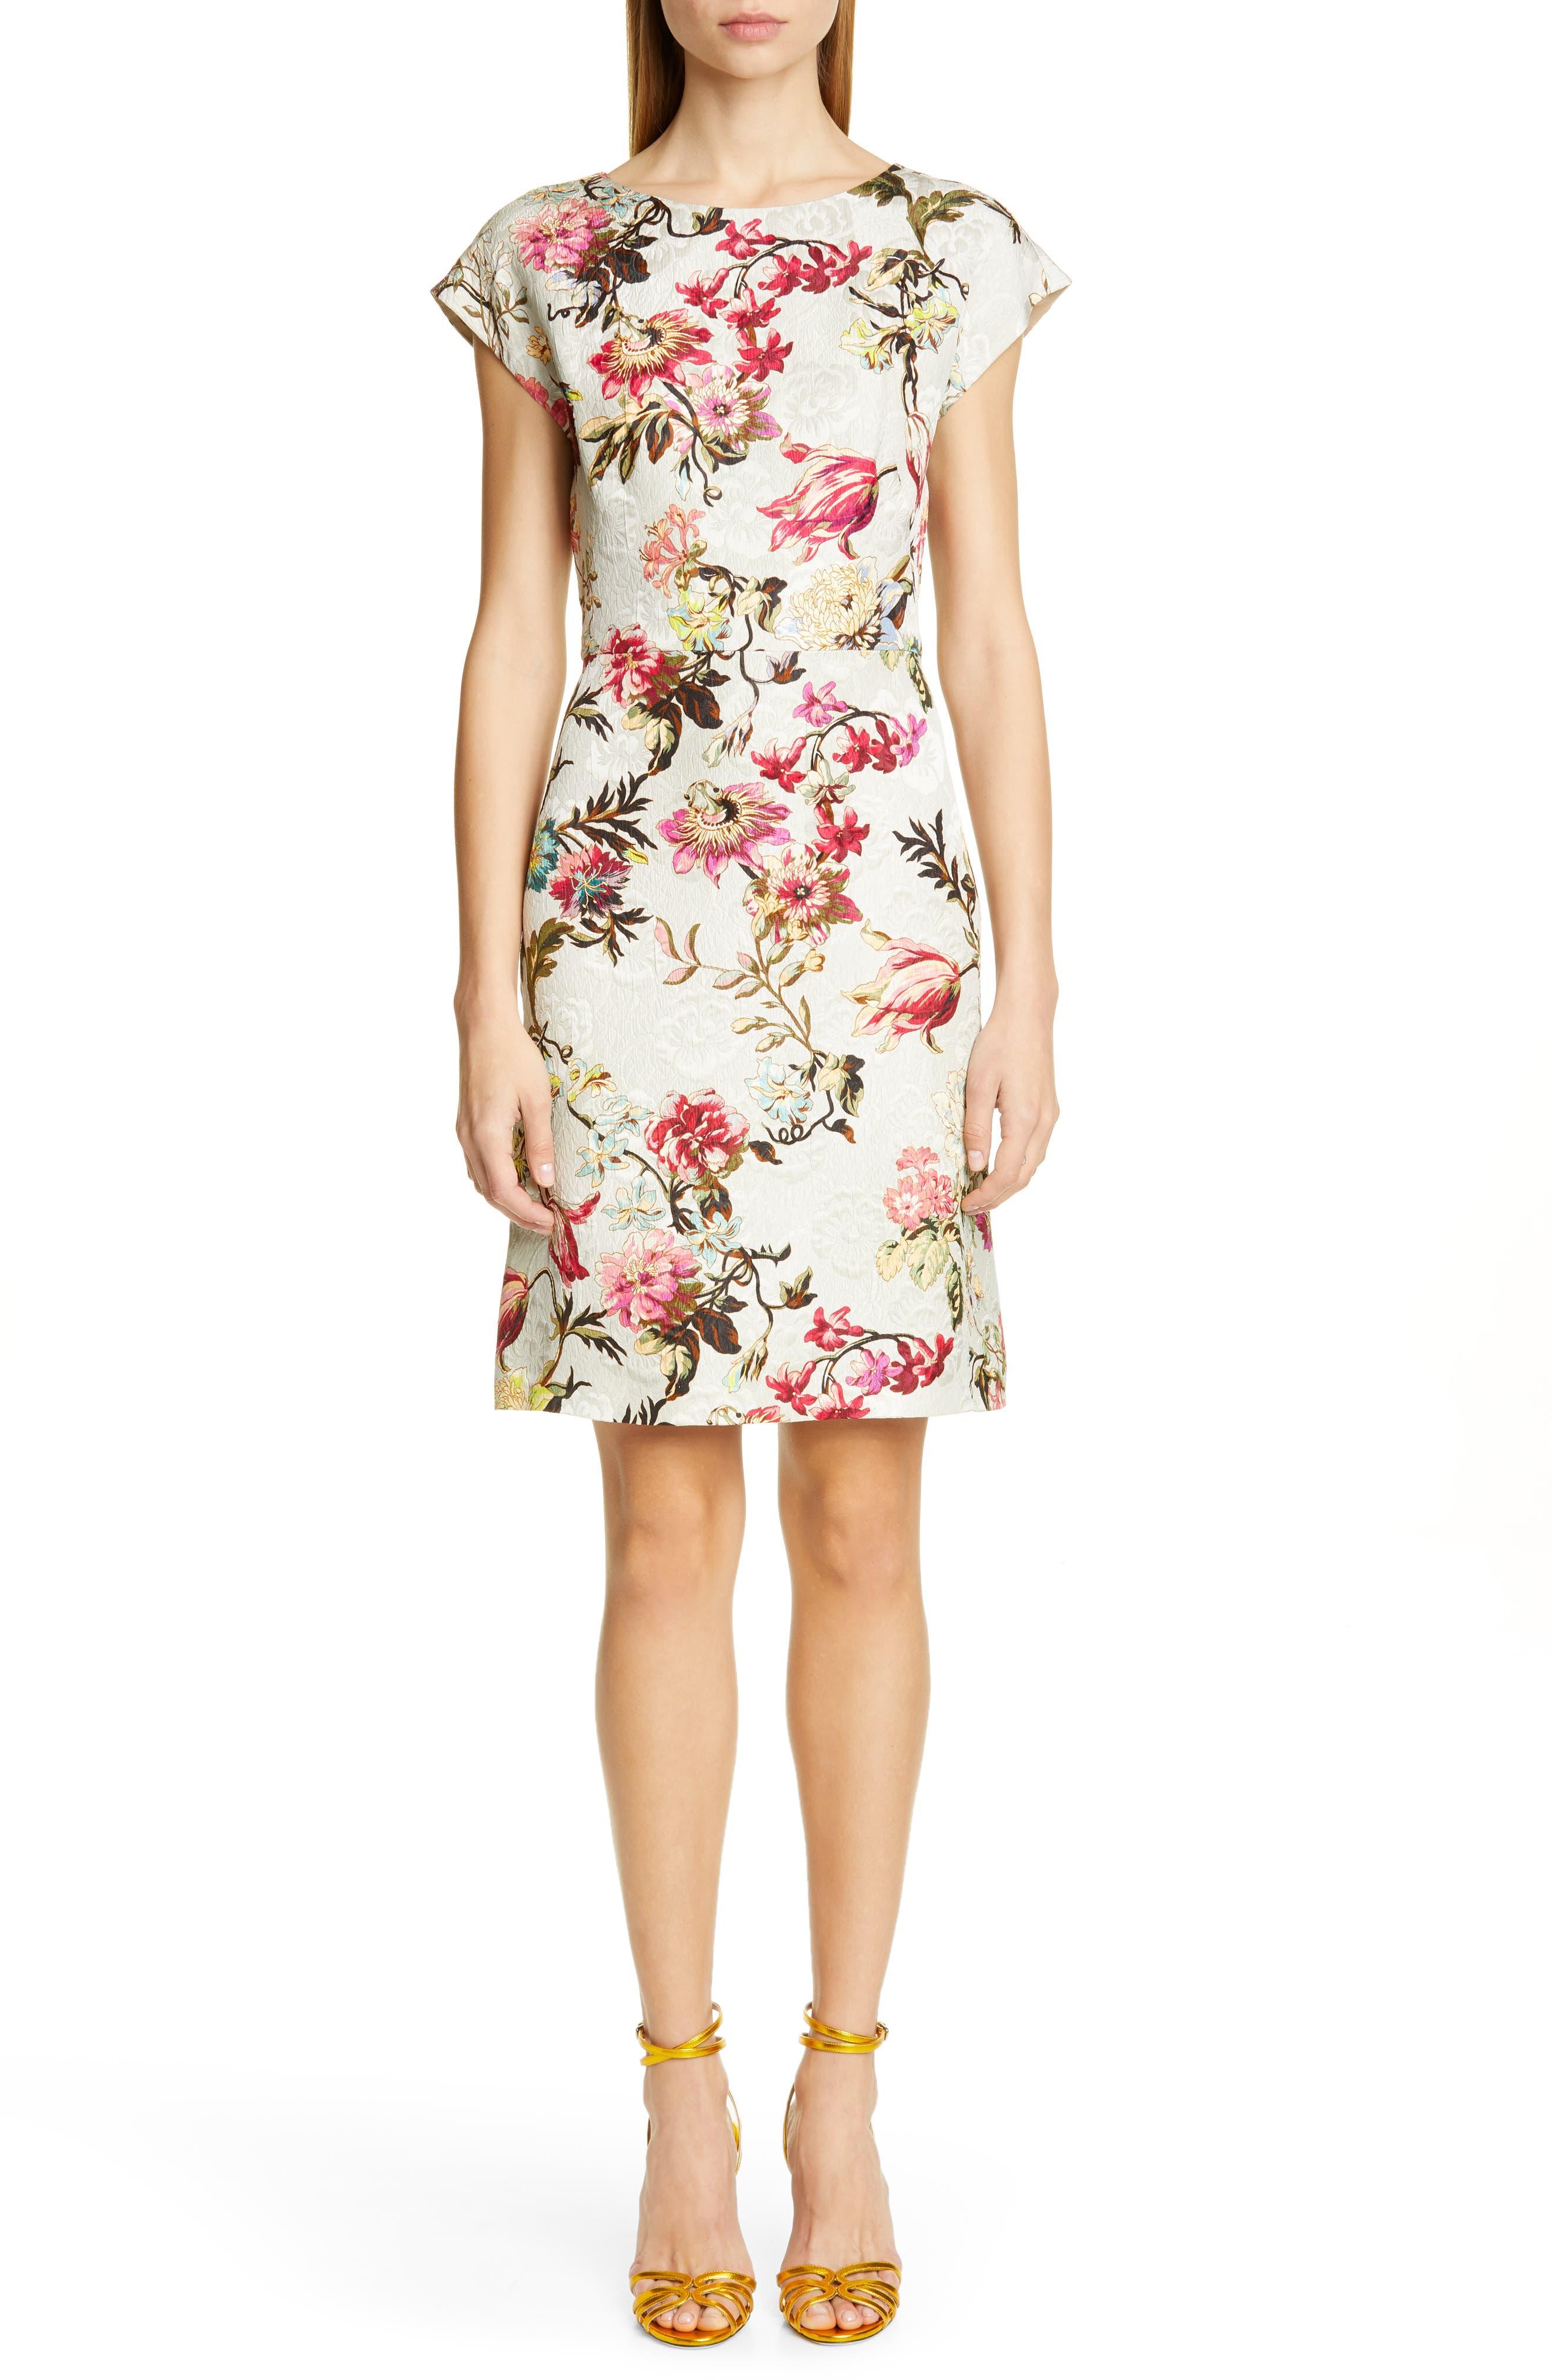 Etro Floral Jacquard Sheath Dress, 8 IT - White